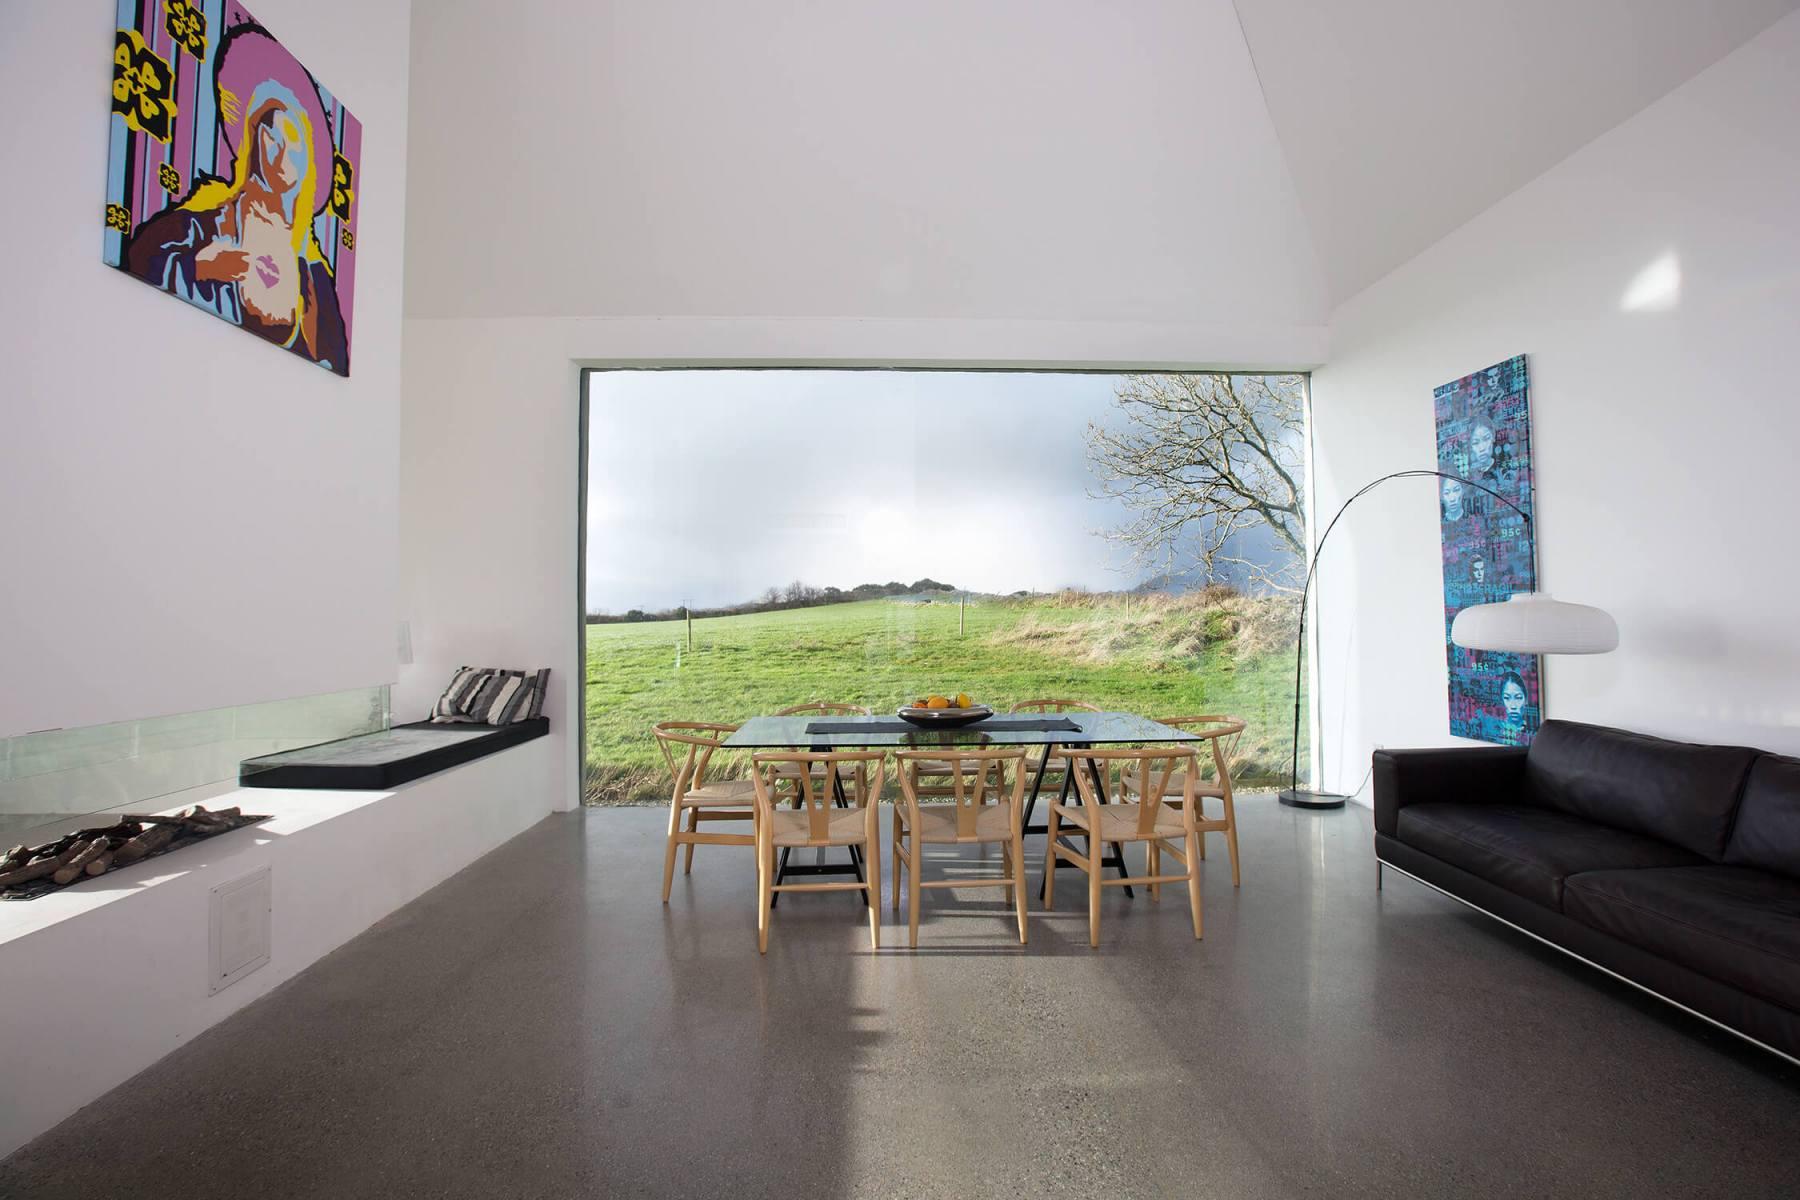 31-interior-dining-room-window-view